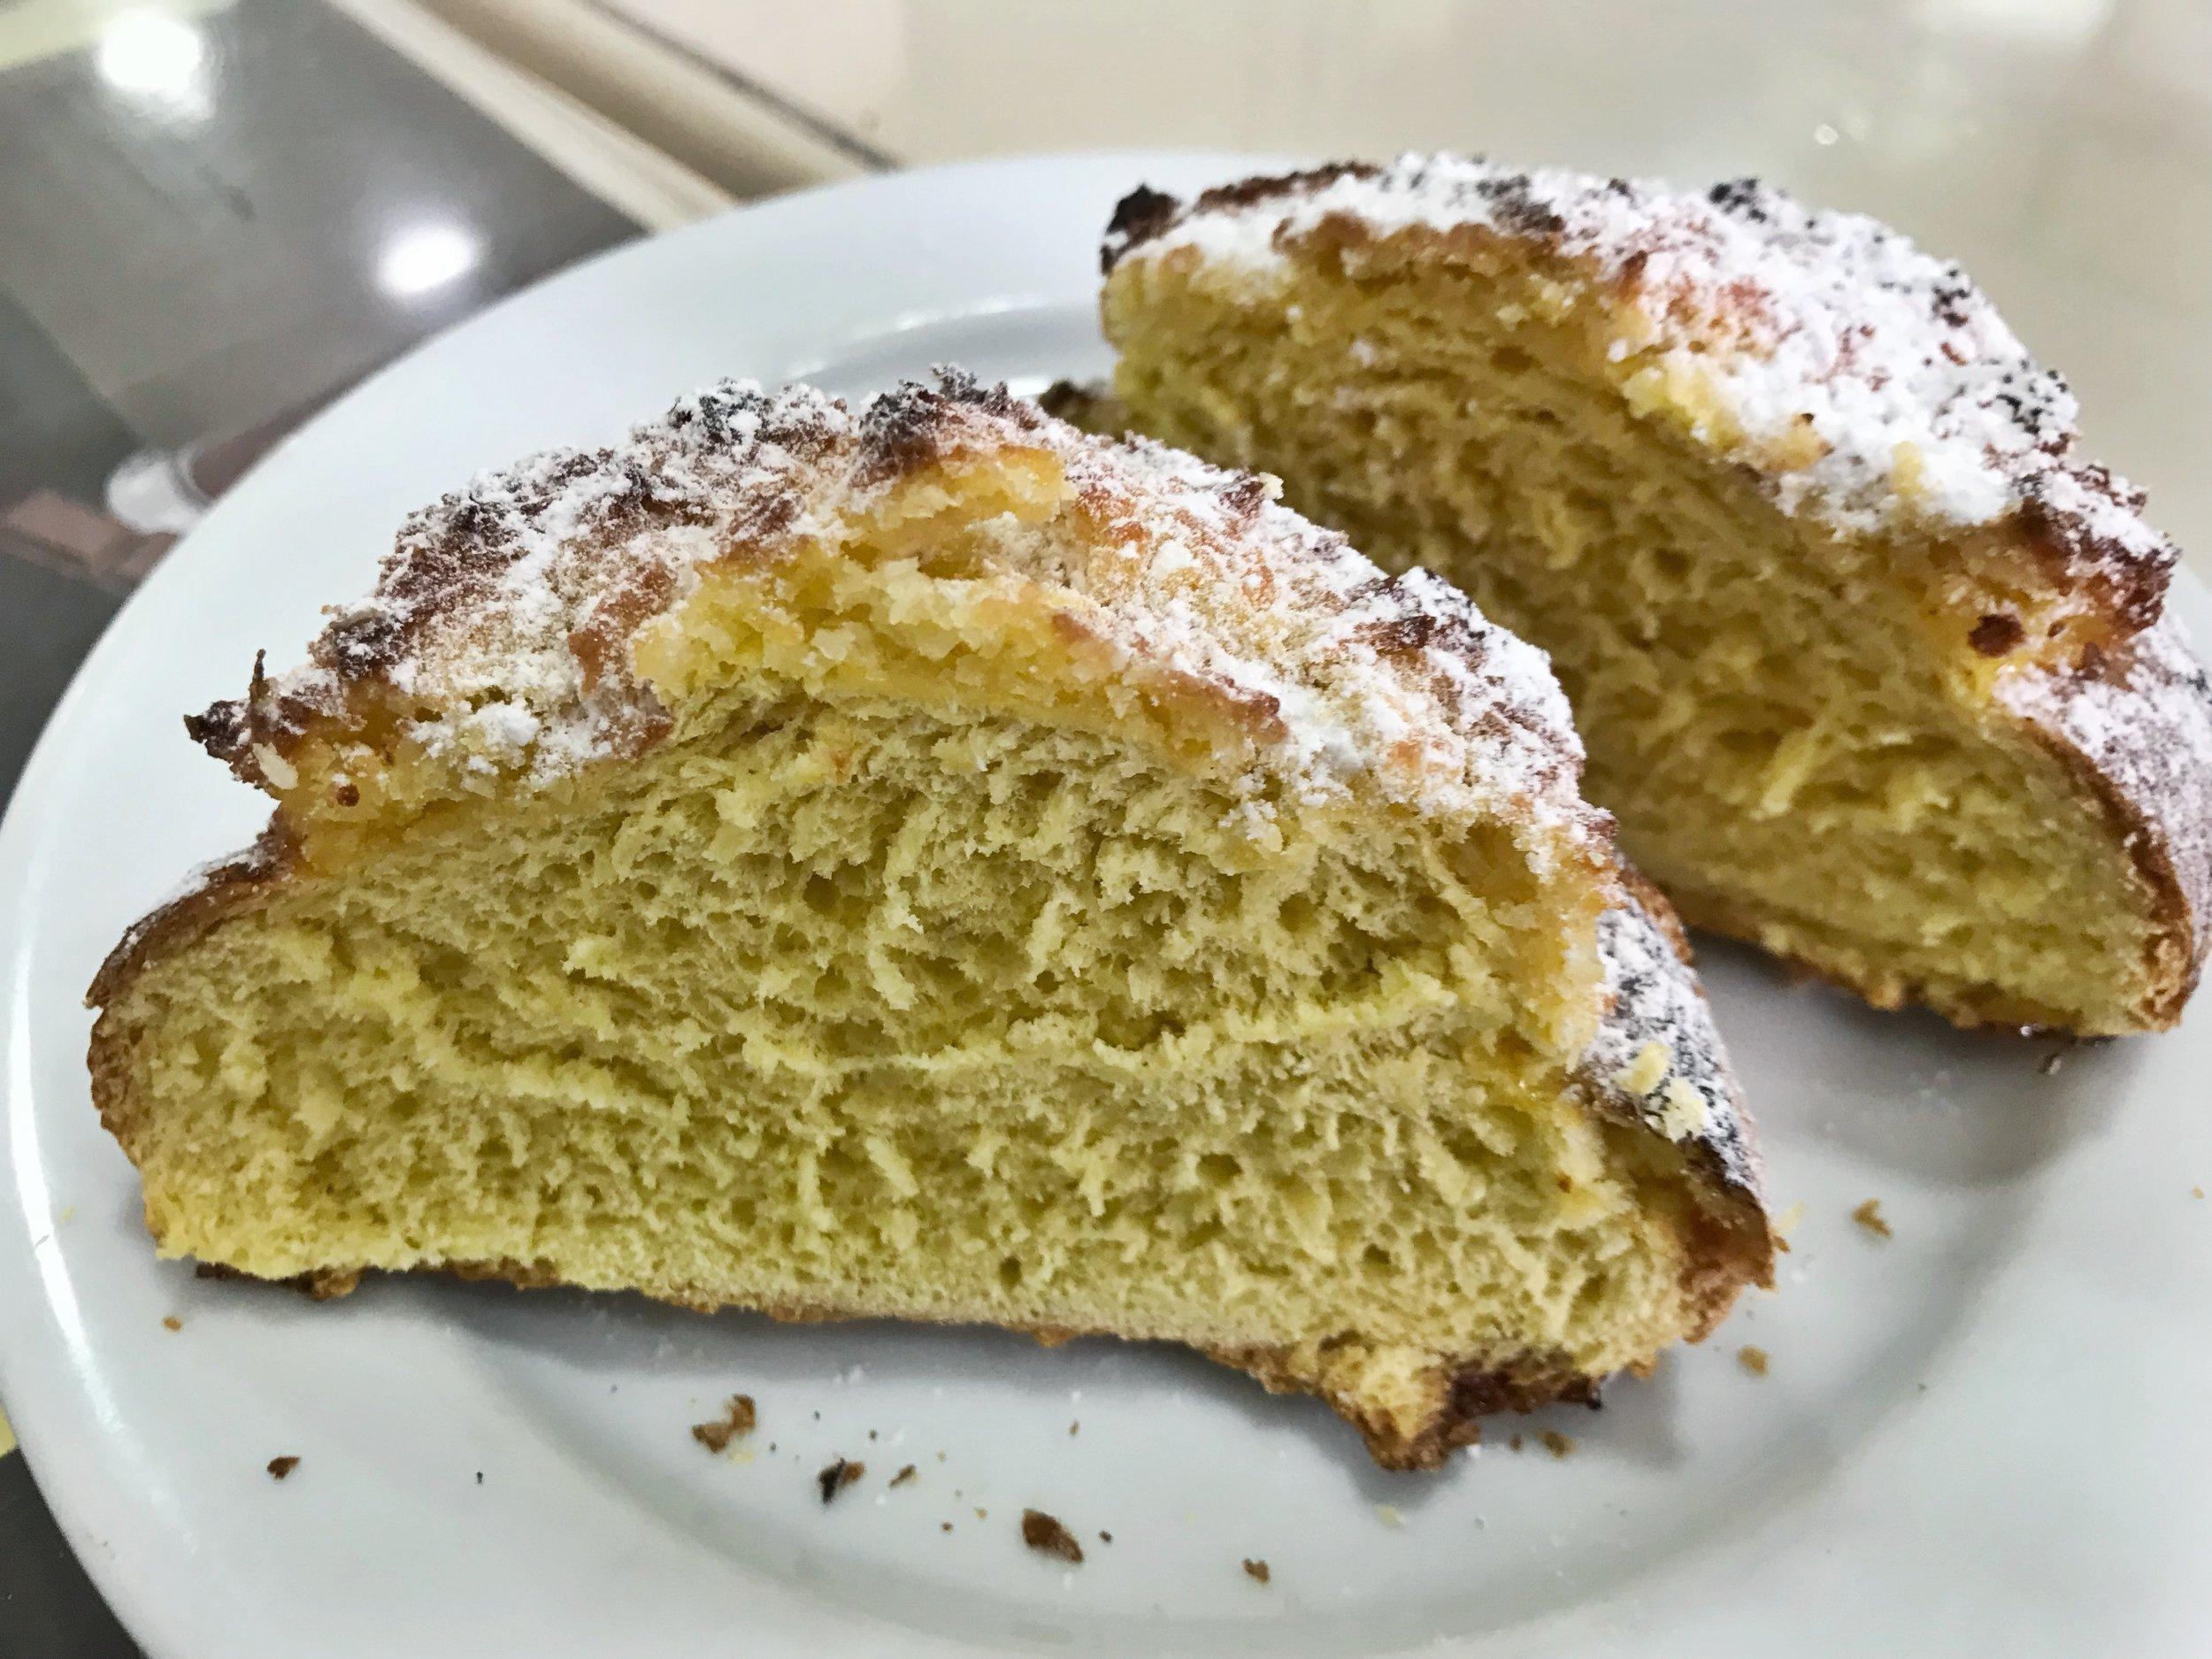 24hourkitchen-travel-guide-to-portuguese-pastries-pastelaria-lisbon-portugal-pao-de-deus